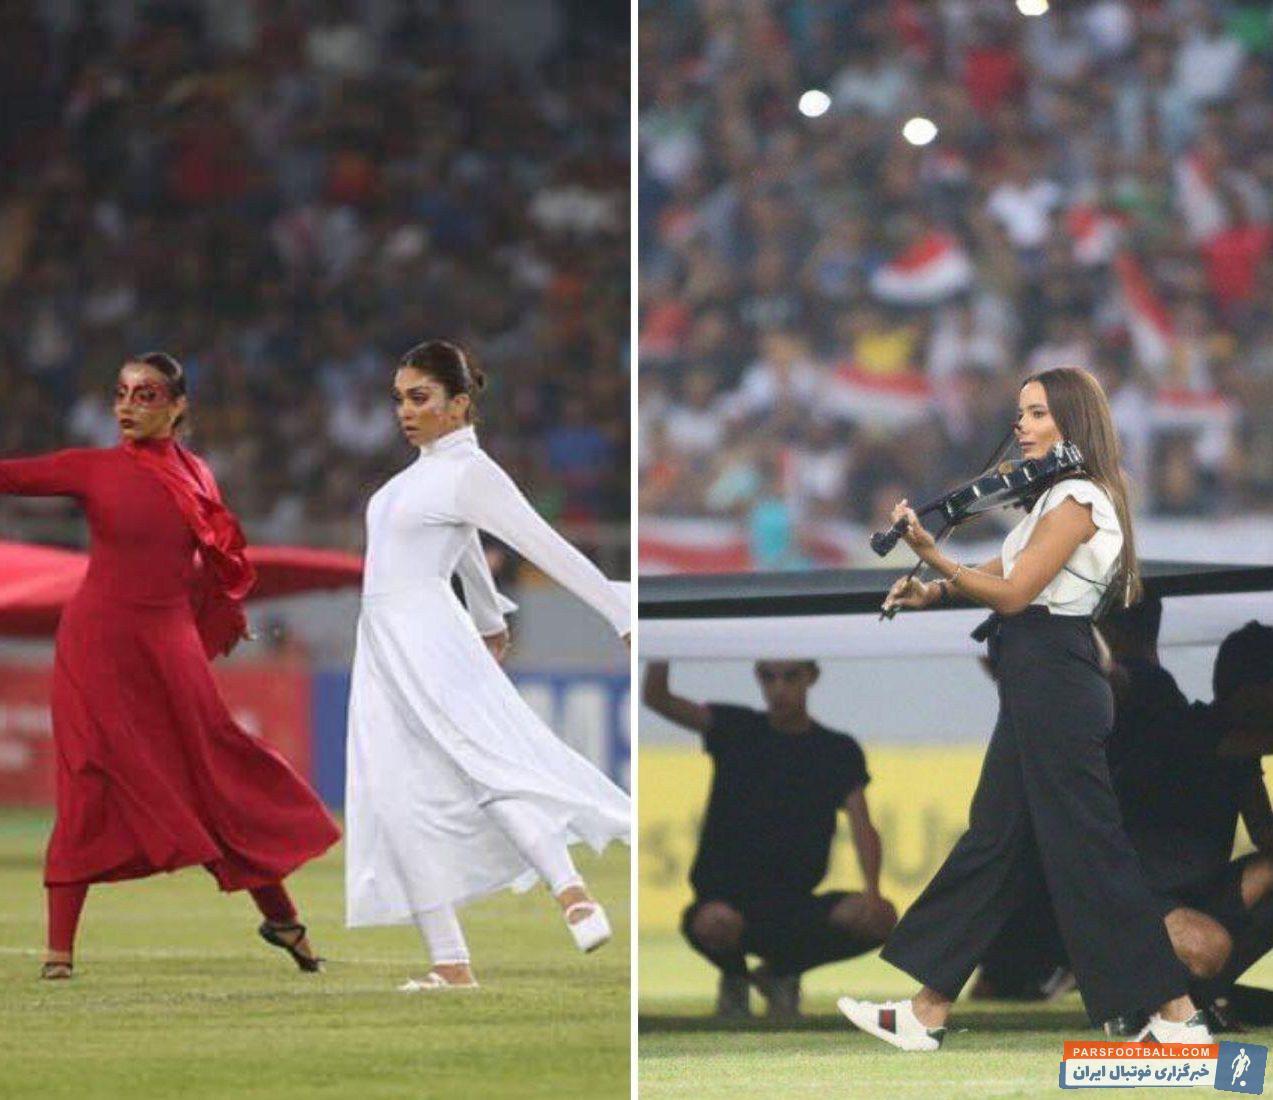 Image result for حضور زنان آوازهخوان در مراسم افتتاحیه مسابقات فوتبال باشگاههای غرب آسیا در ورزشگاه کربلا